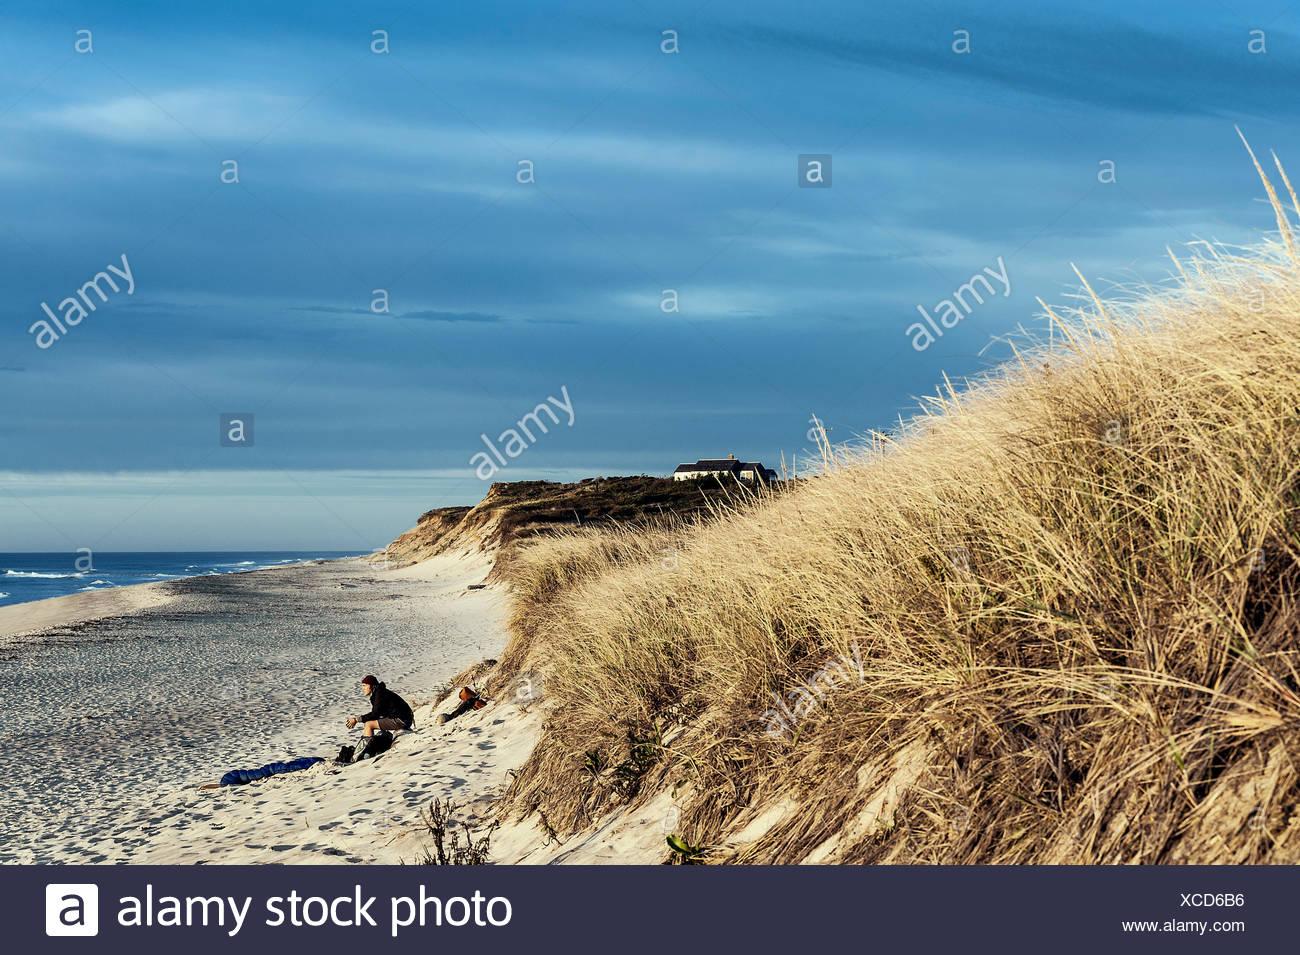 Sunrise solitude, Wellfleet, Cape Cod, Massachusetts, USA - Stock Image